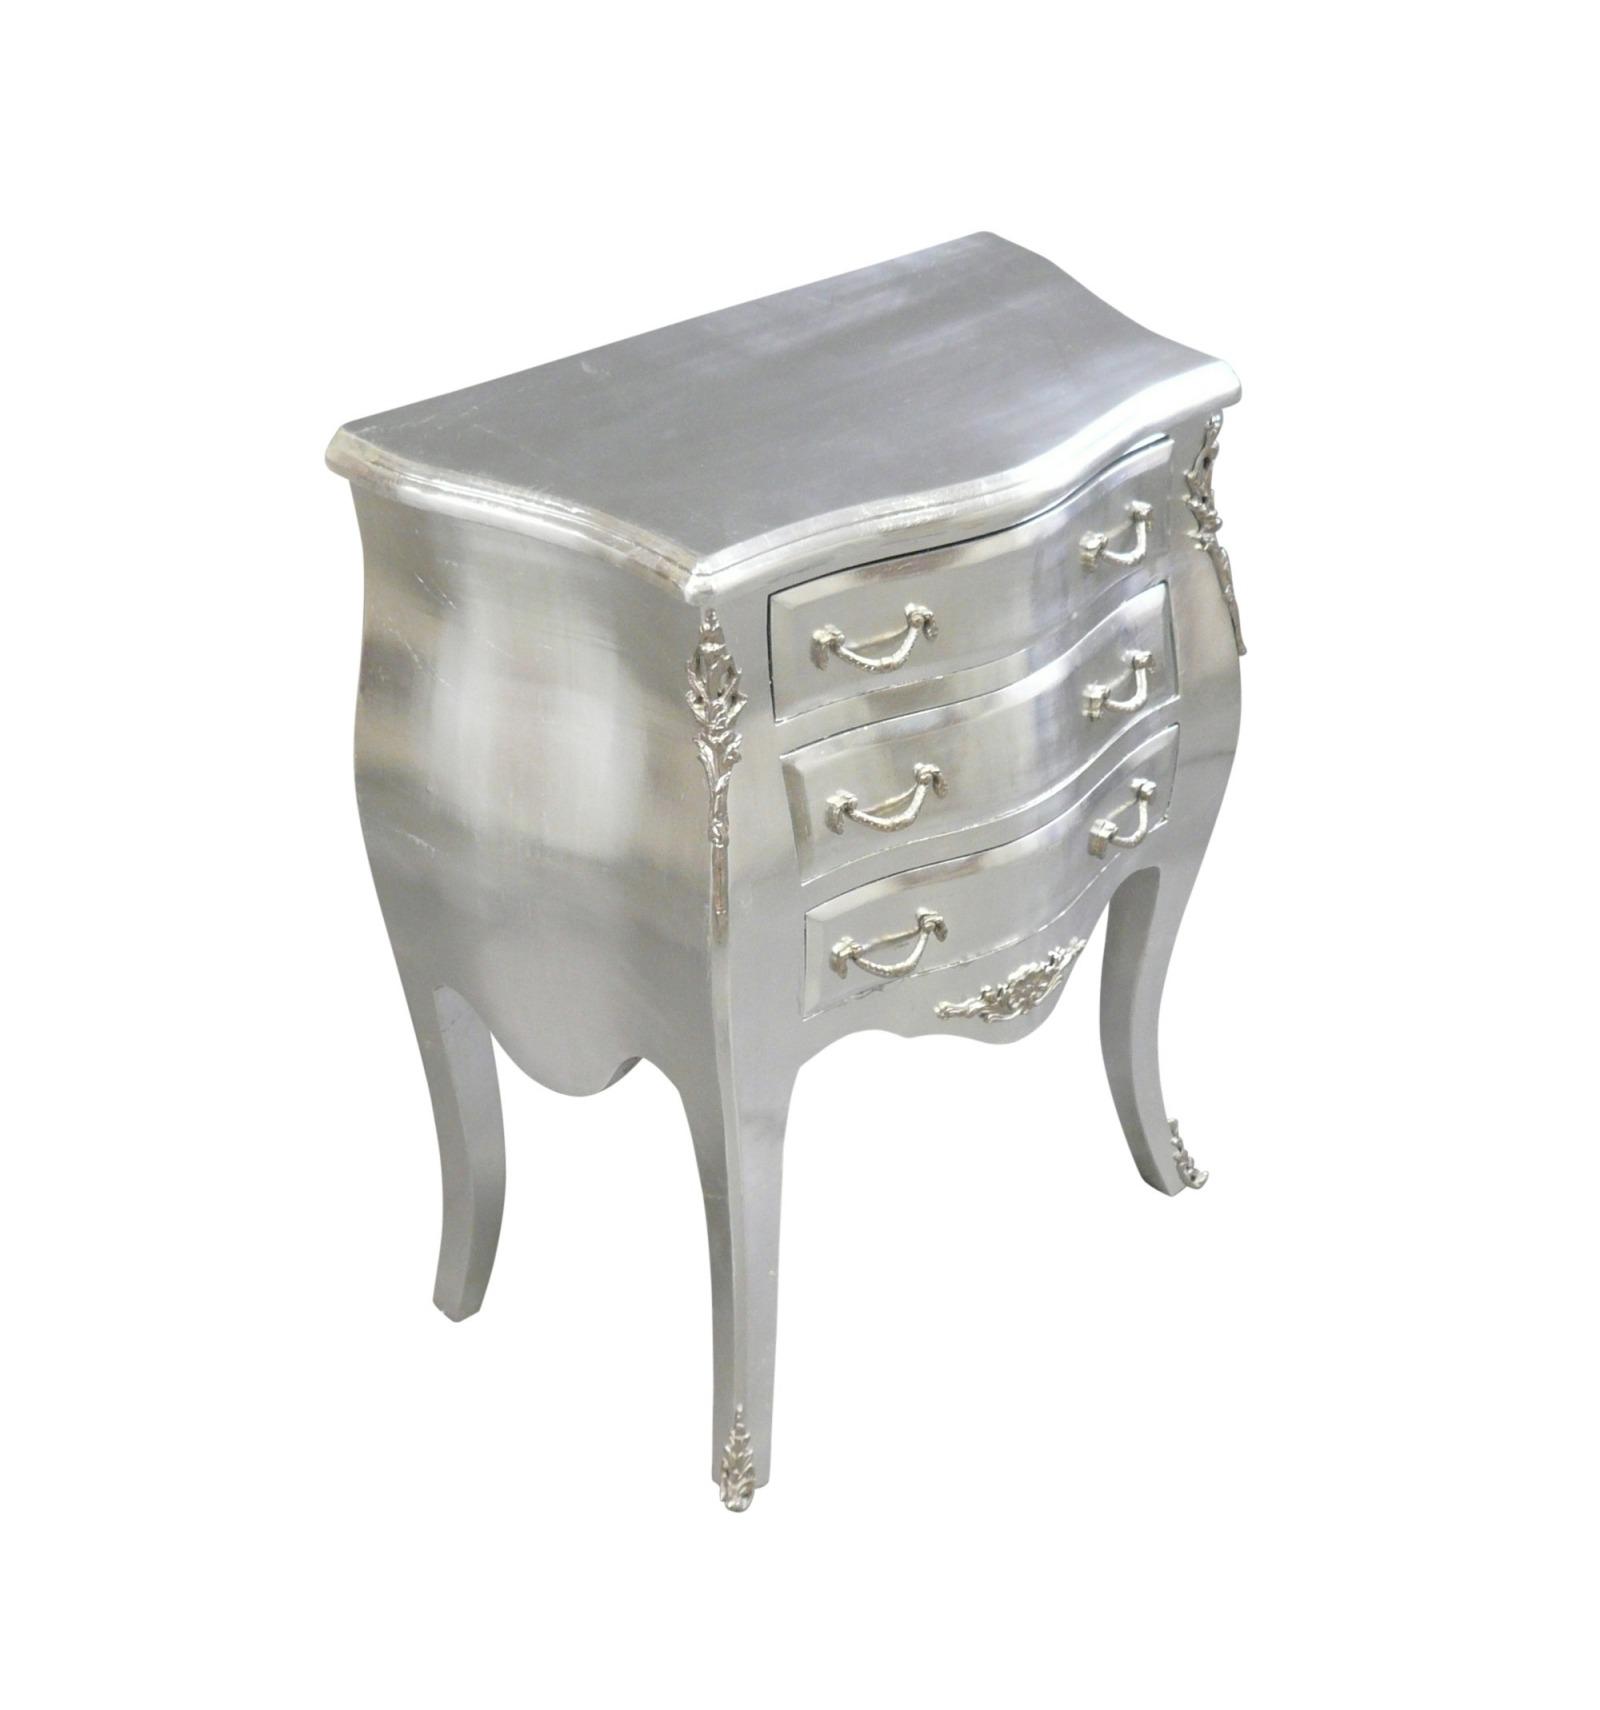 commode baroque deux tiroirs argent es. Black Bedroom Furniture Sets. Home Design Ideas